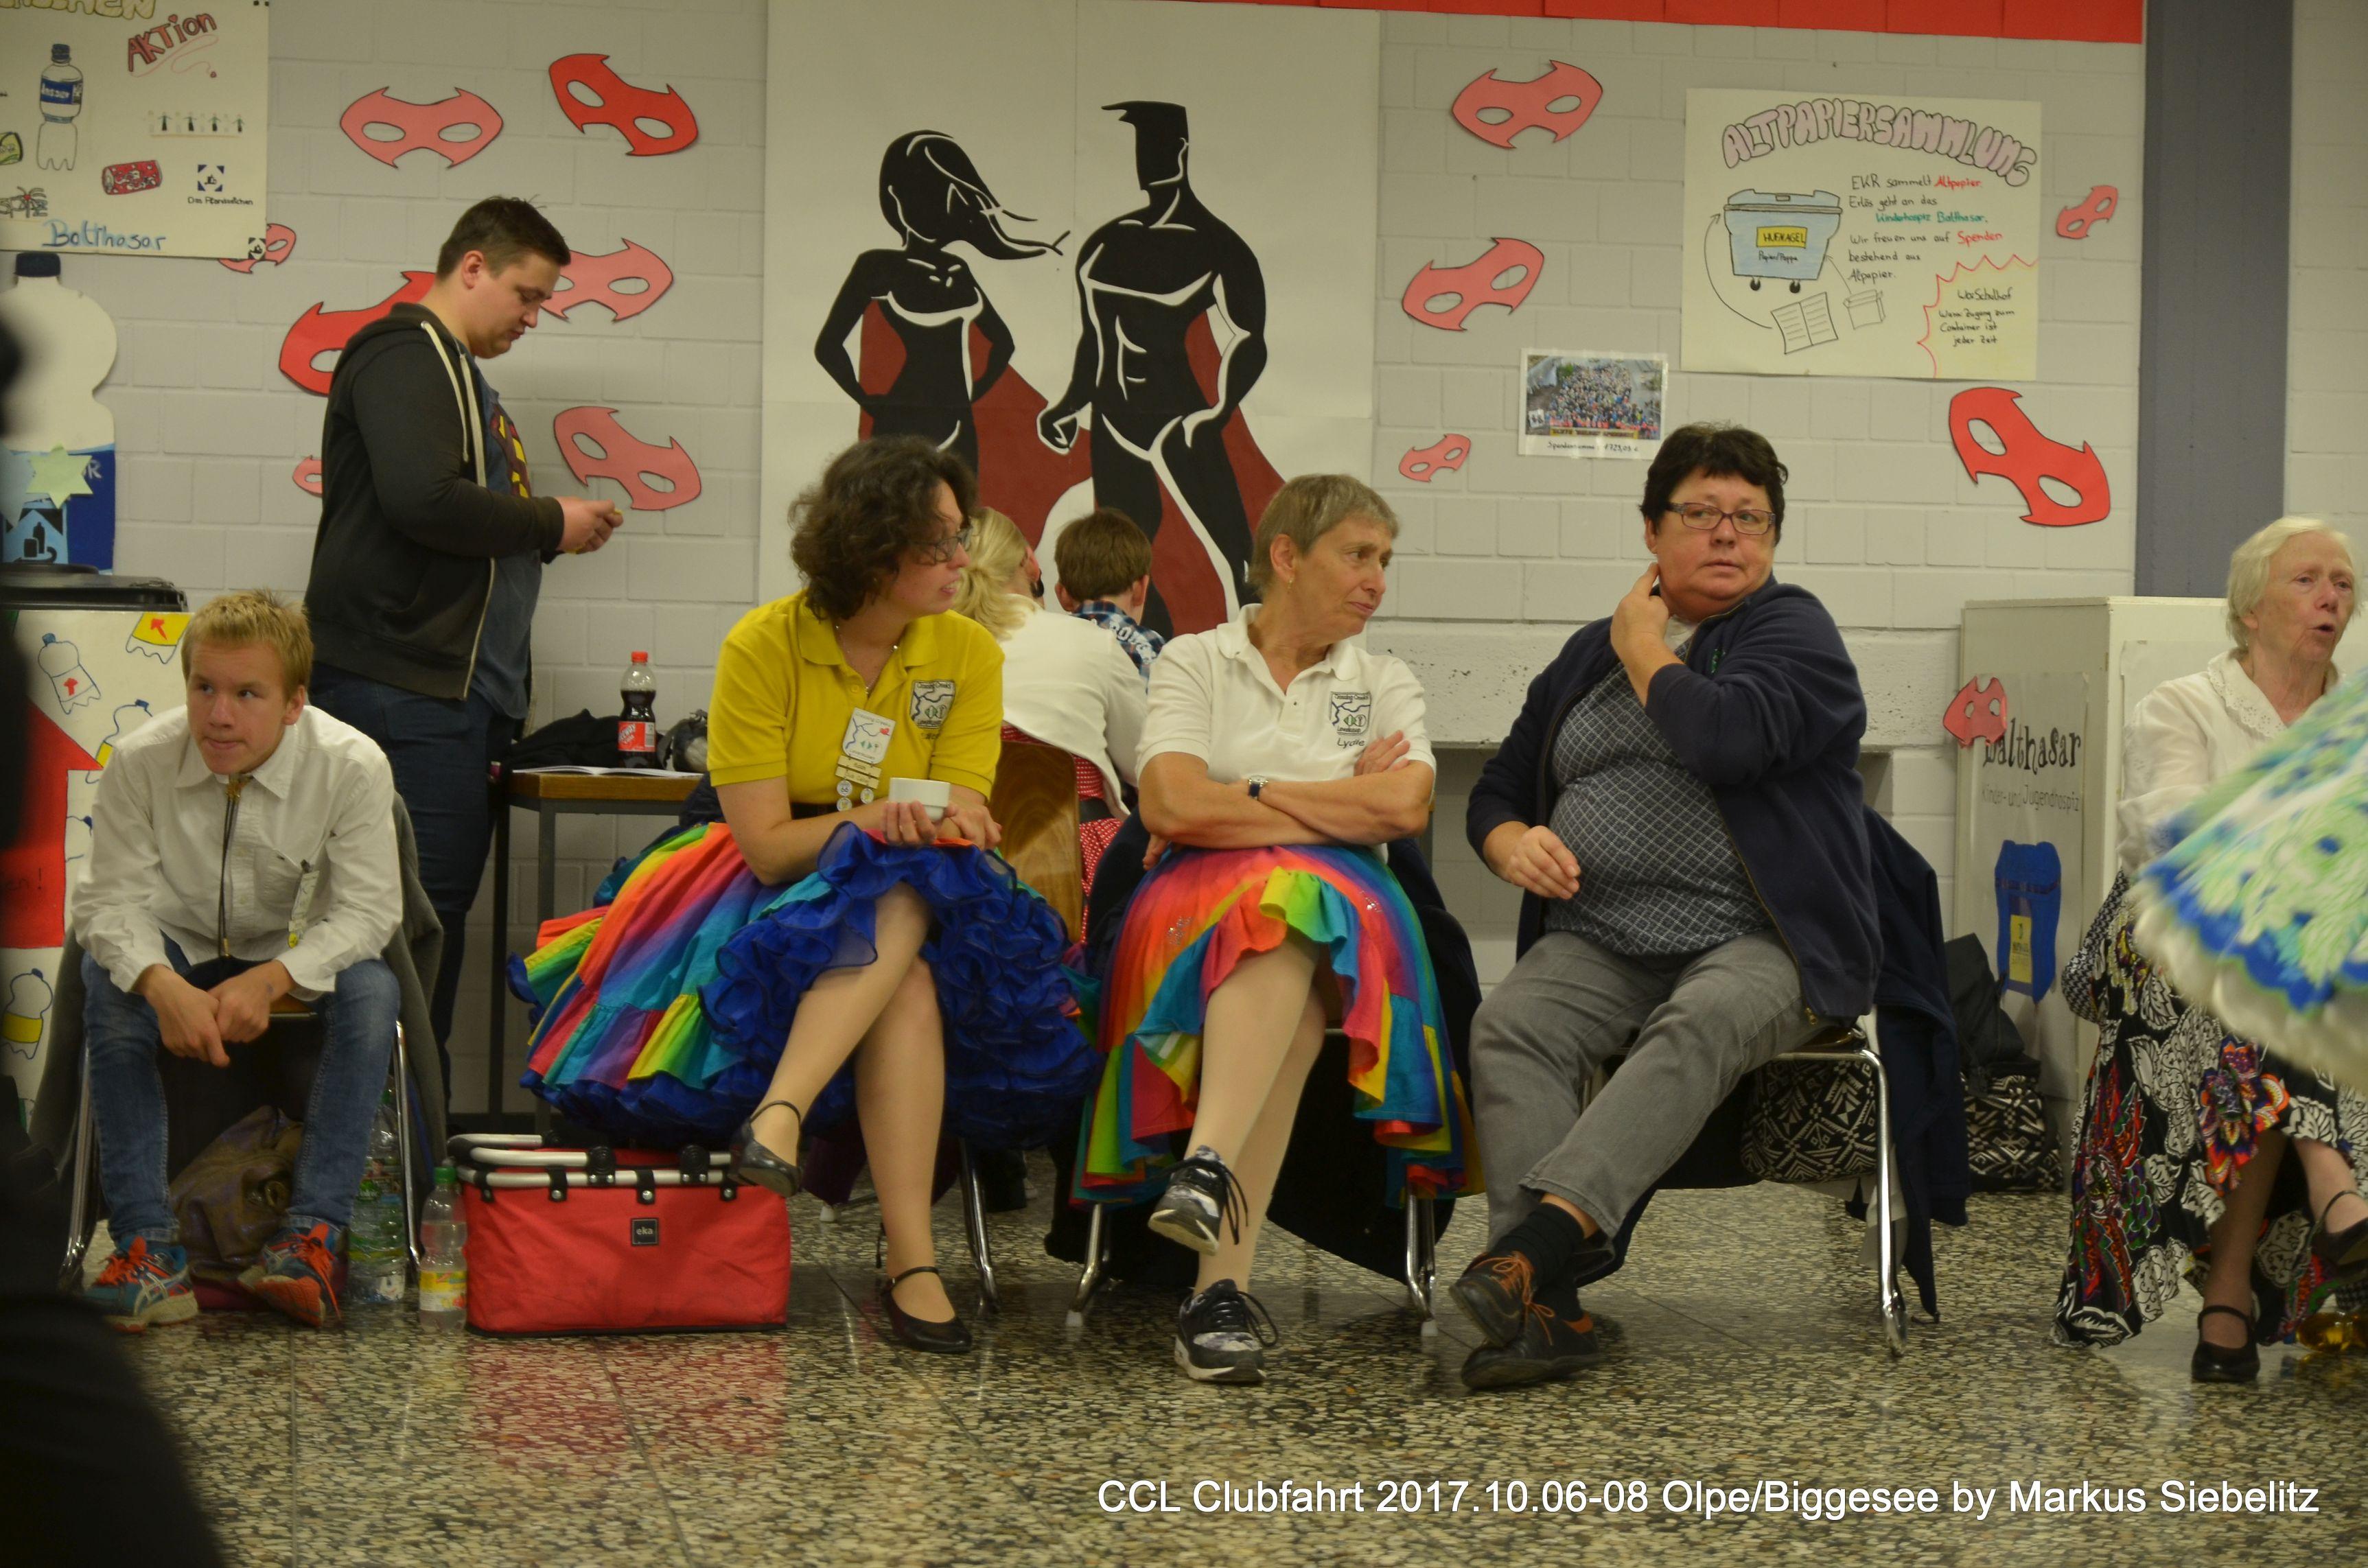 CCL Clubfahrt 2017.10.06-08 Biggesee (59)